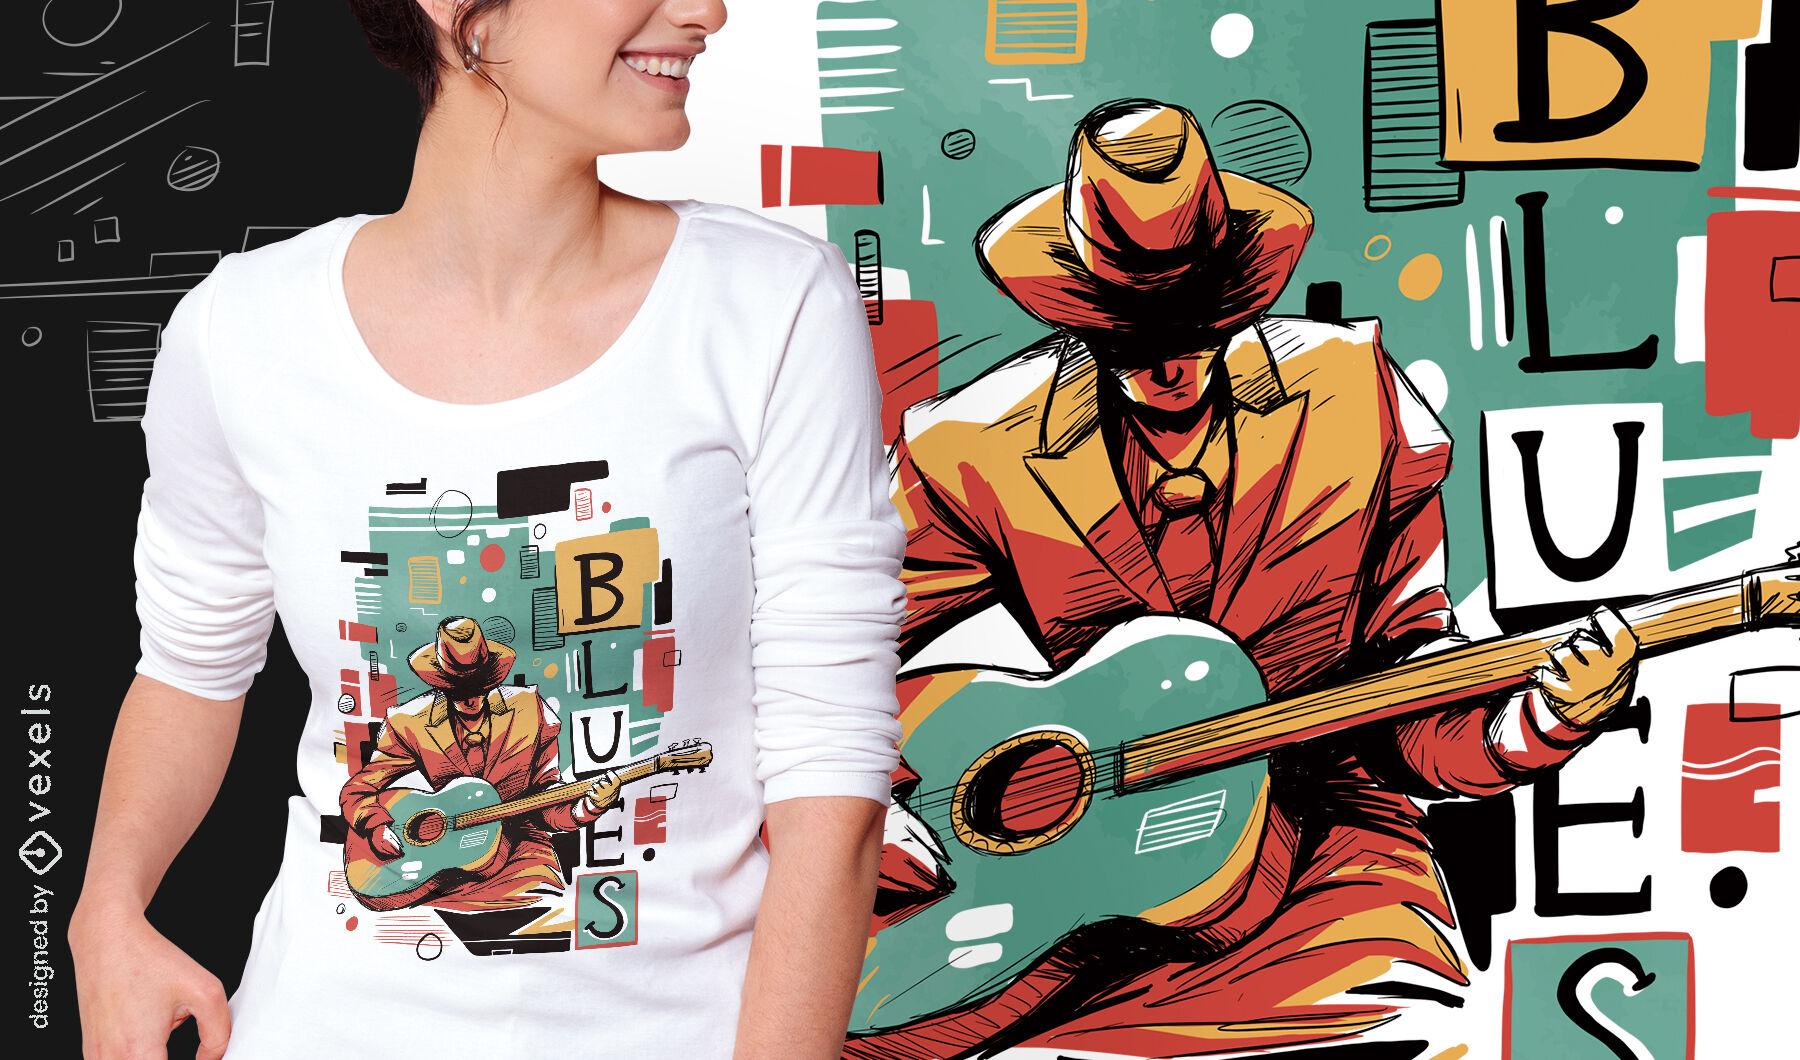 Camiseta psd abstrata do músico de blues